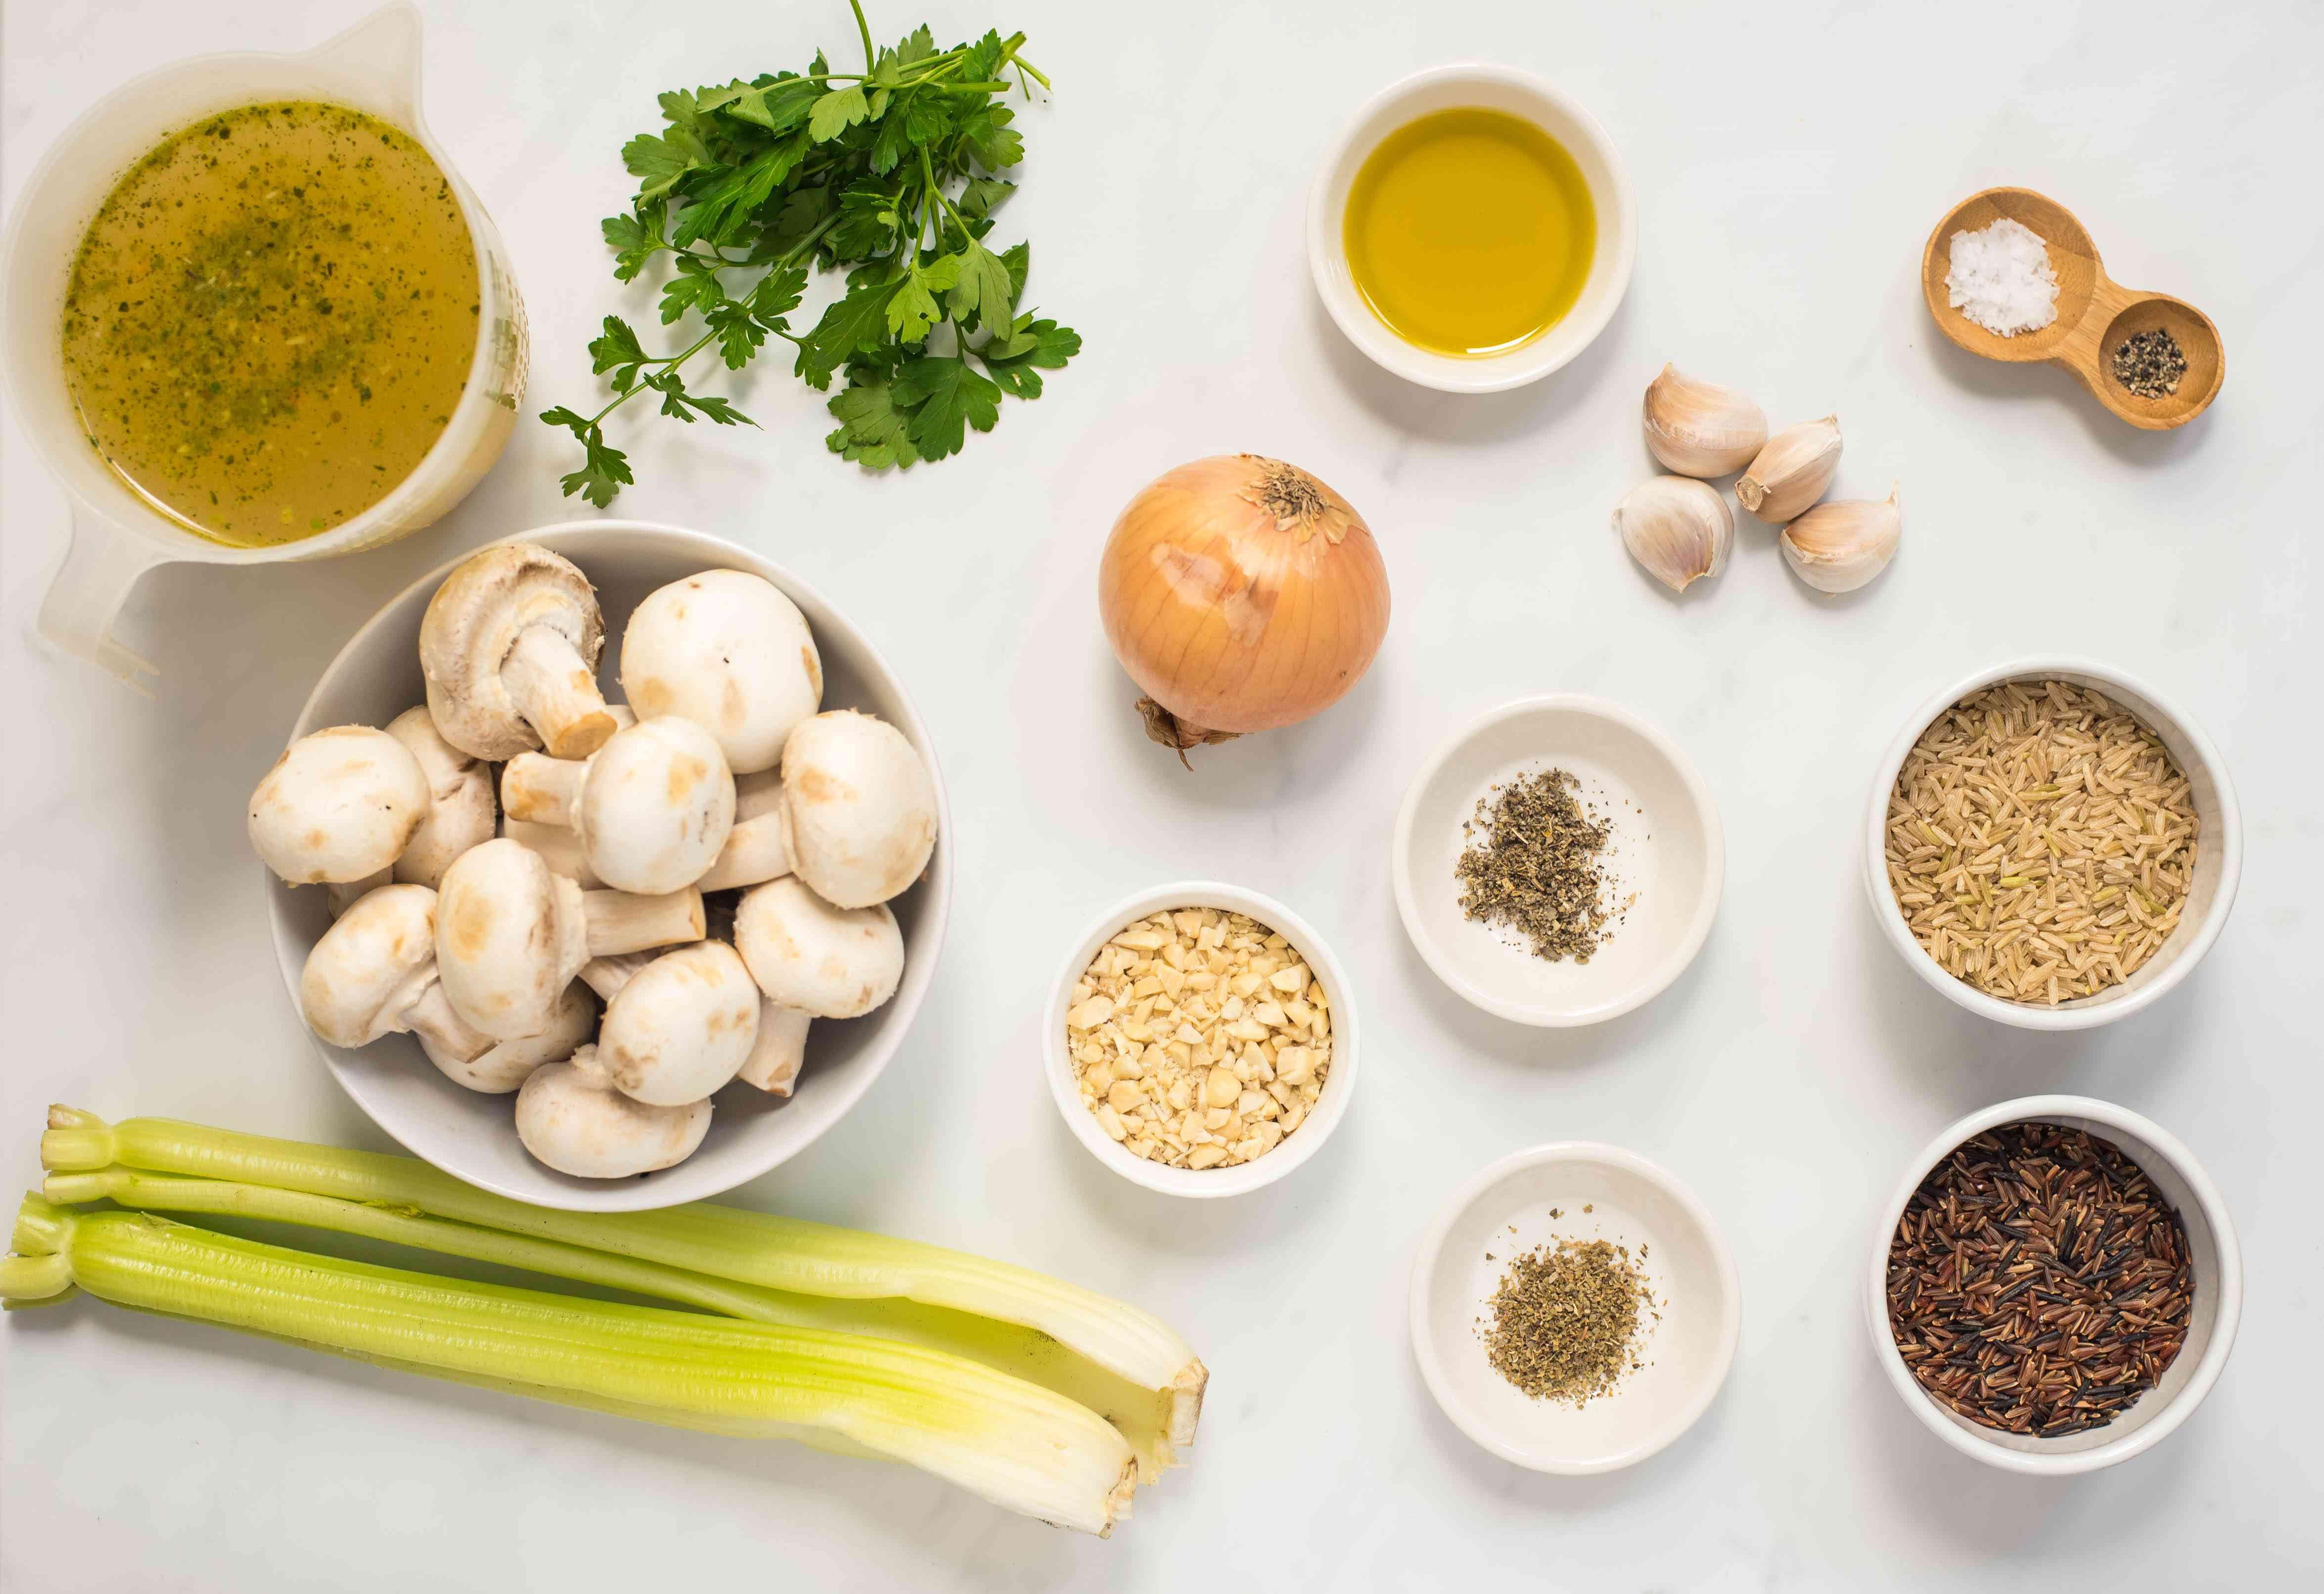 Ingredients for vegetarian wild rice and mushroom pilaf